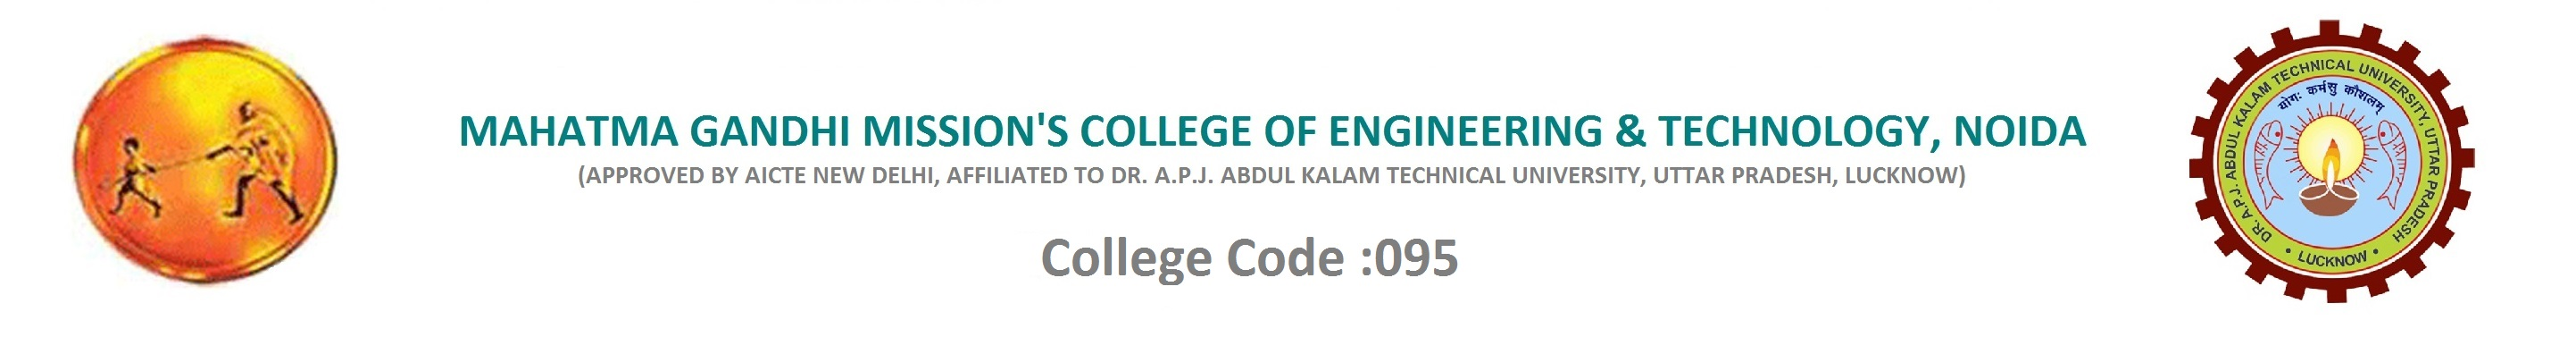 MAHATMA GANDHI MISSION'S COLLEGE OF ENGINEERING & TECHNOLOGY, NOIDA